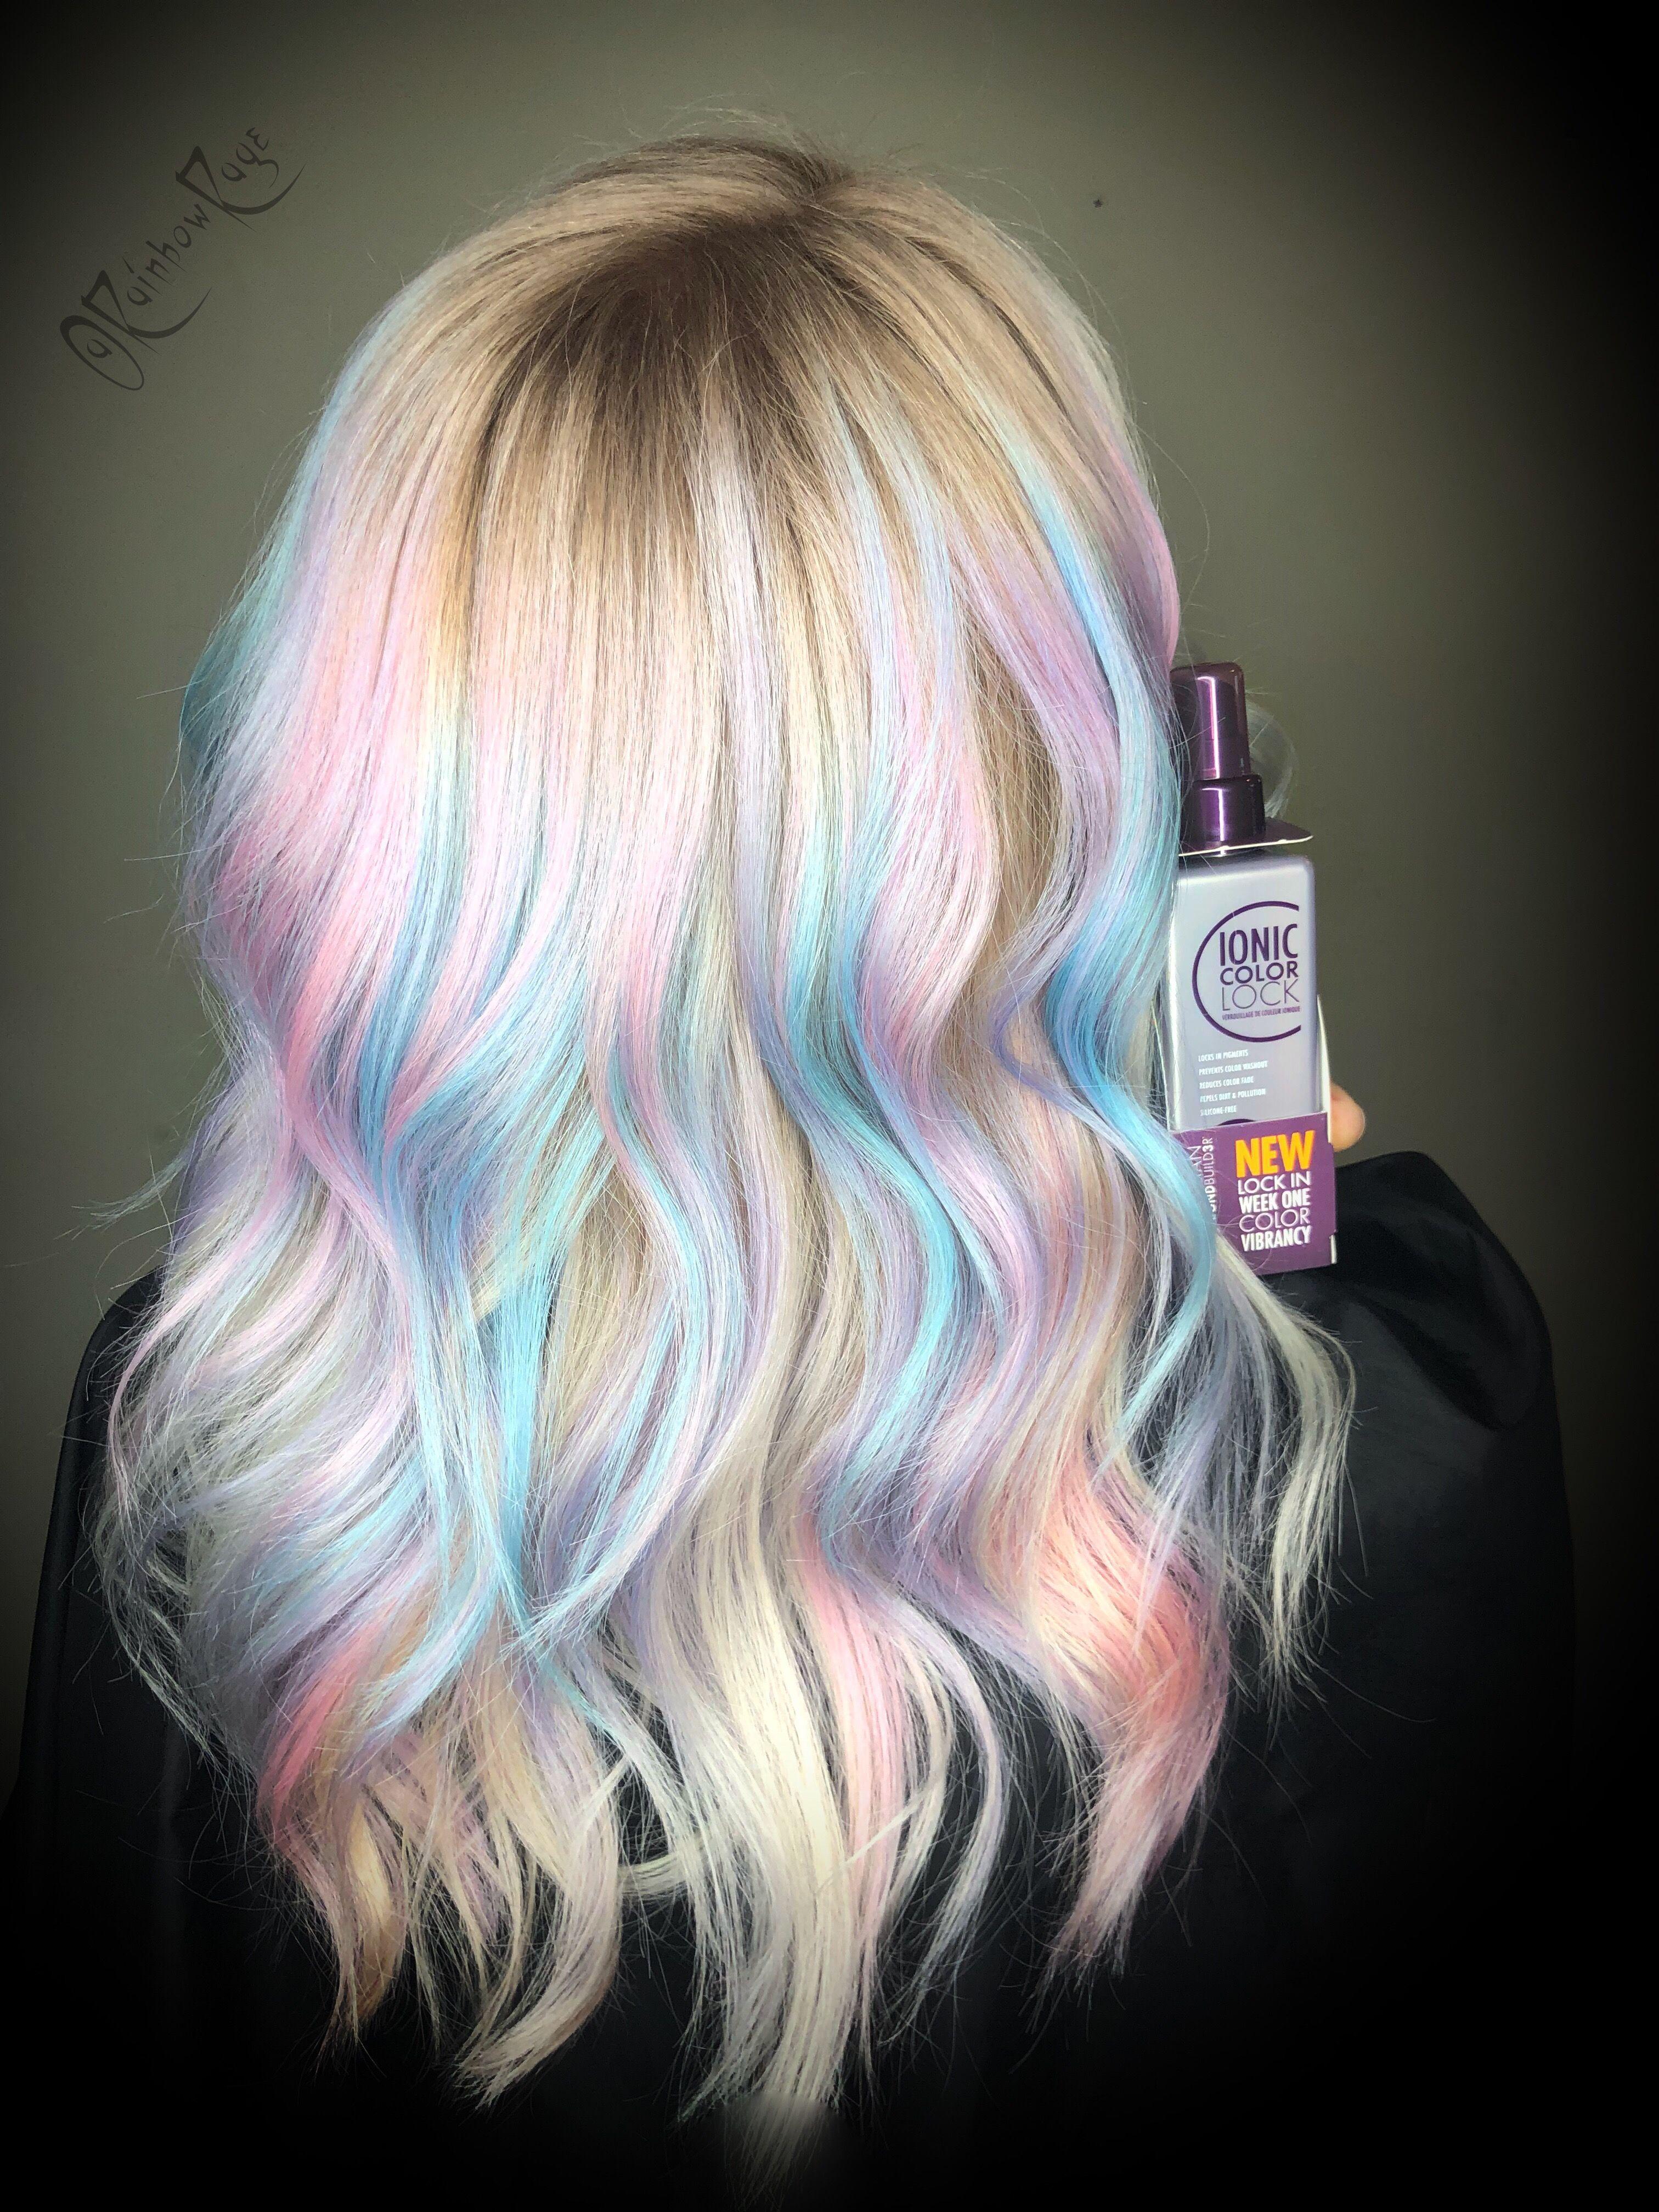 Pastel Hair Pastel Rainbow Hair Hair Color Pastel Hair Styles